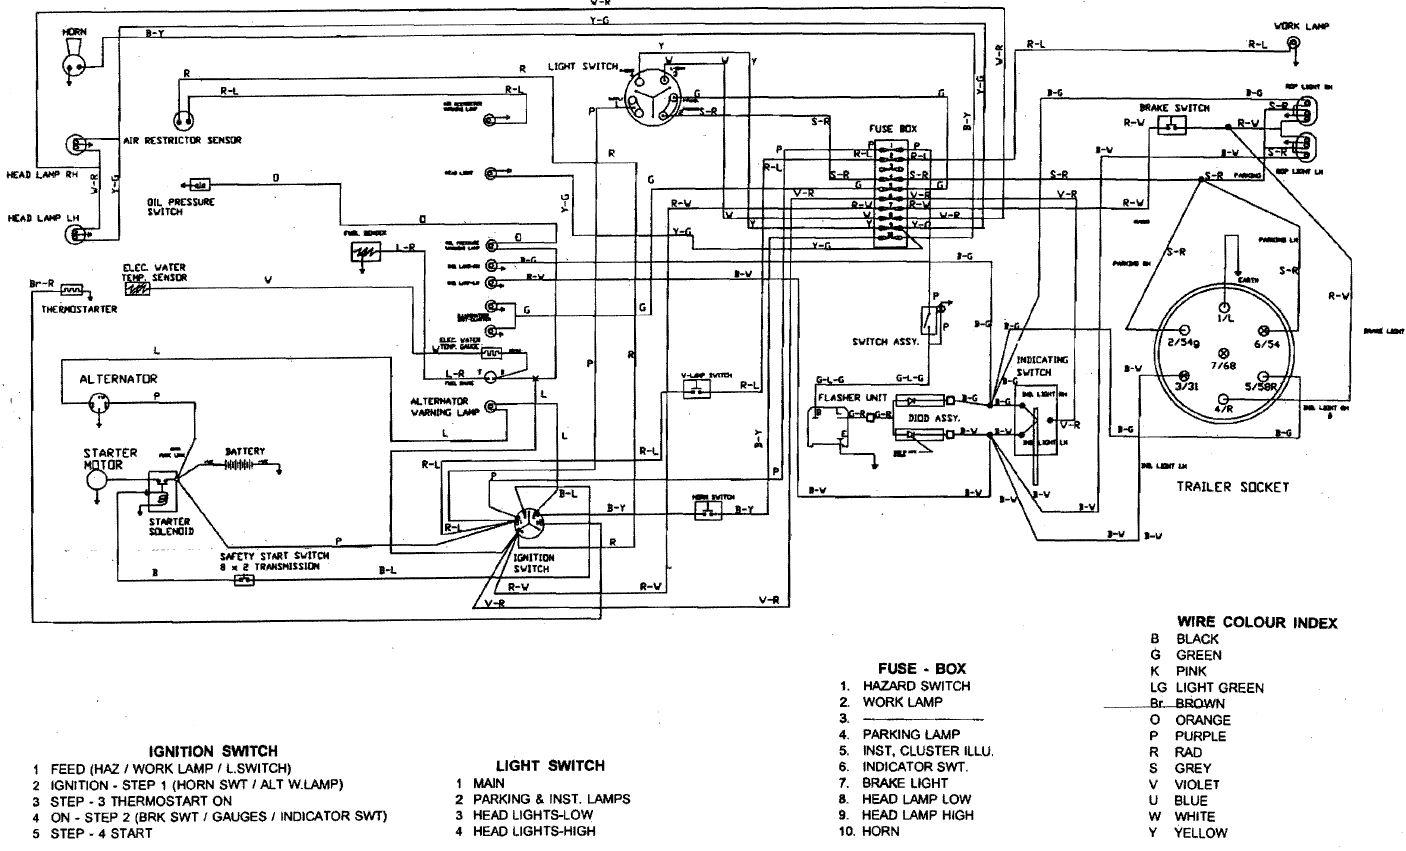 Ignition Switch Wiring Diagram - Generator Transfer Switch Wiring Diagram